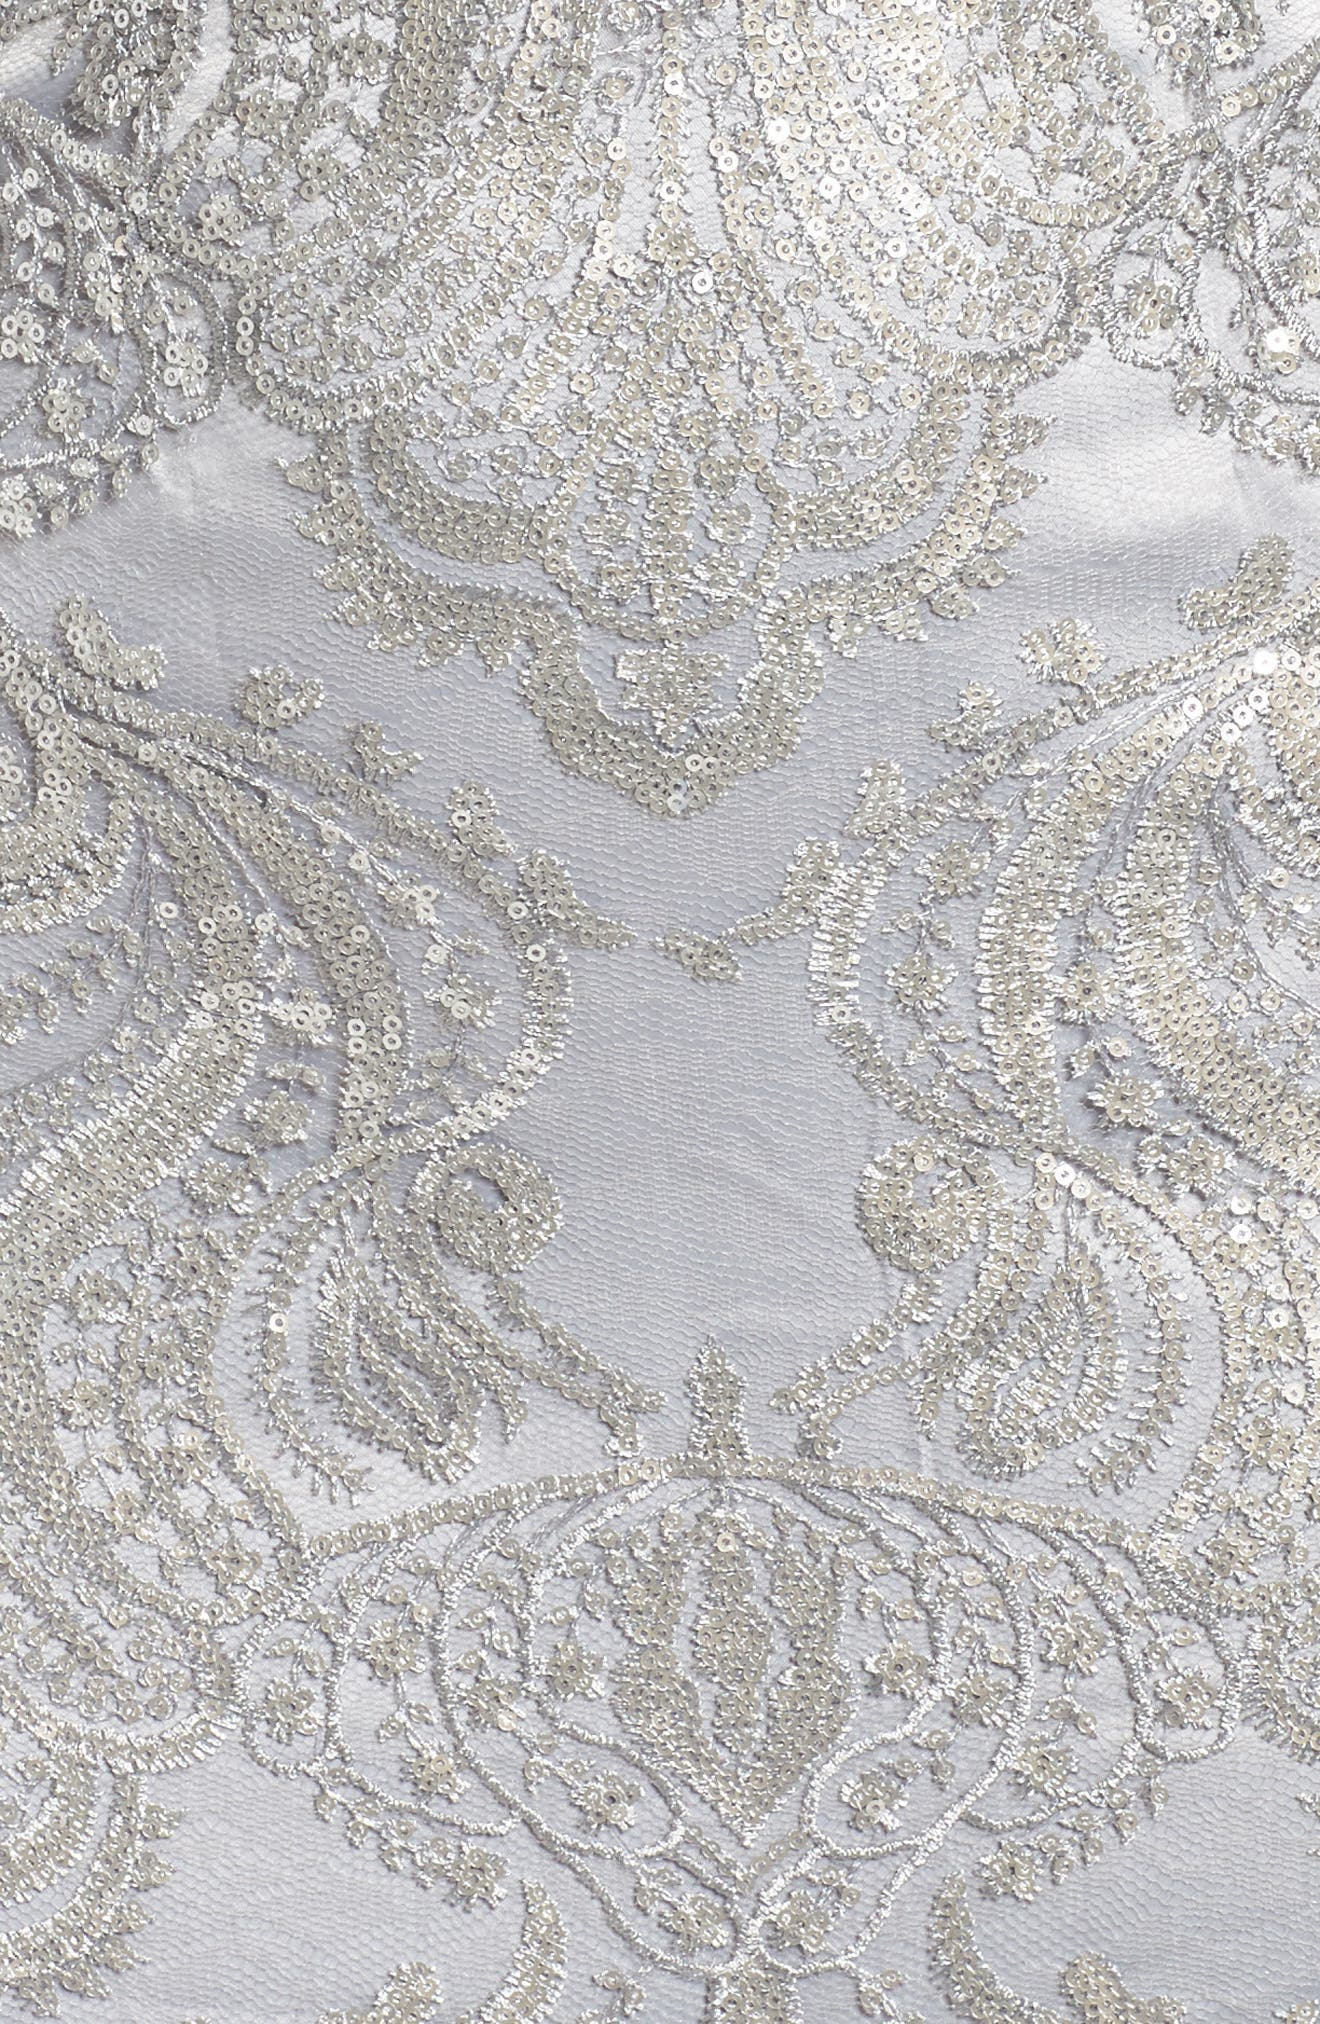 Sequin Illusion Sheath Dress,                             Alternate thumbnail 5, color,                             Silver